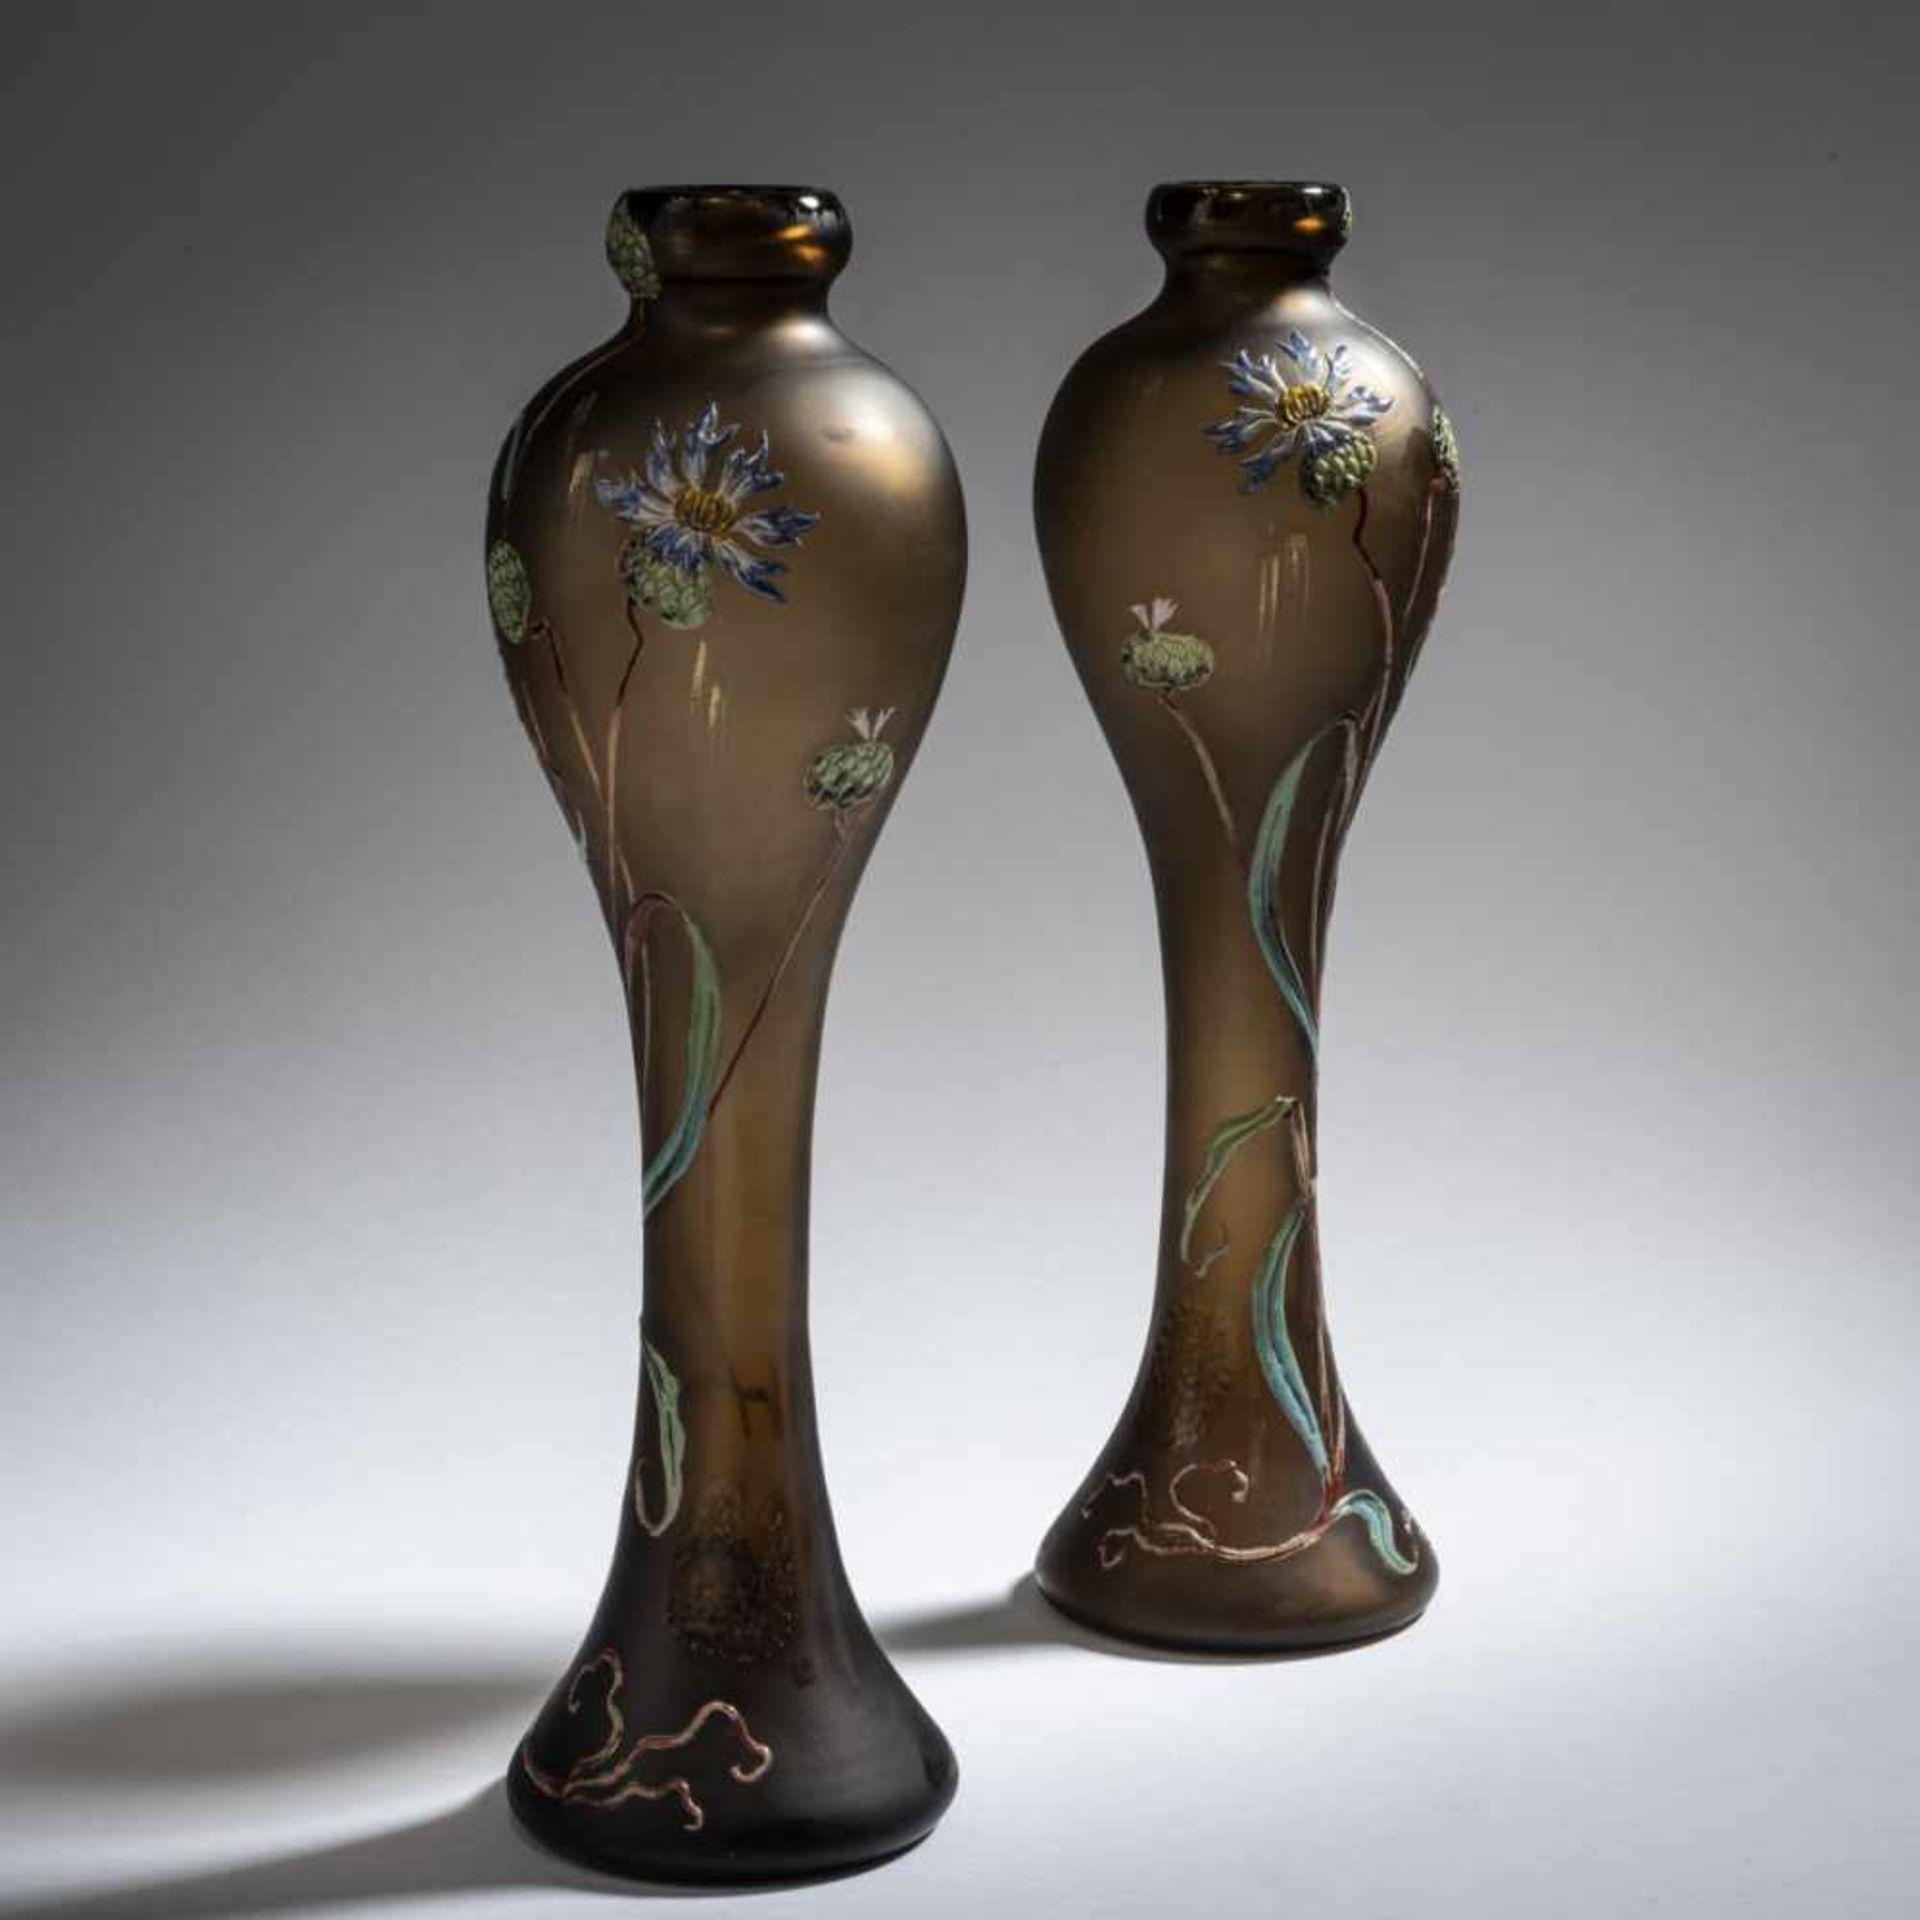 Verrerie d'Art de Lorraine, Burgun Schverer & Cie., Meisenthal, Pair of vases 'Bleuets', c. 1895-